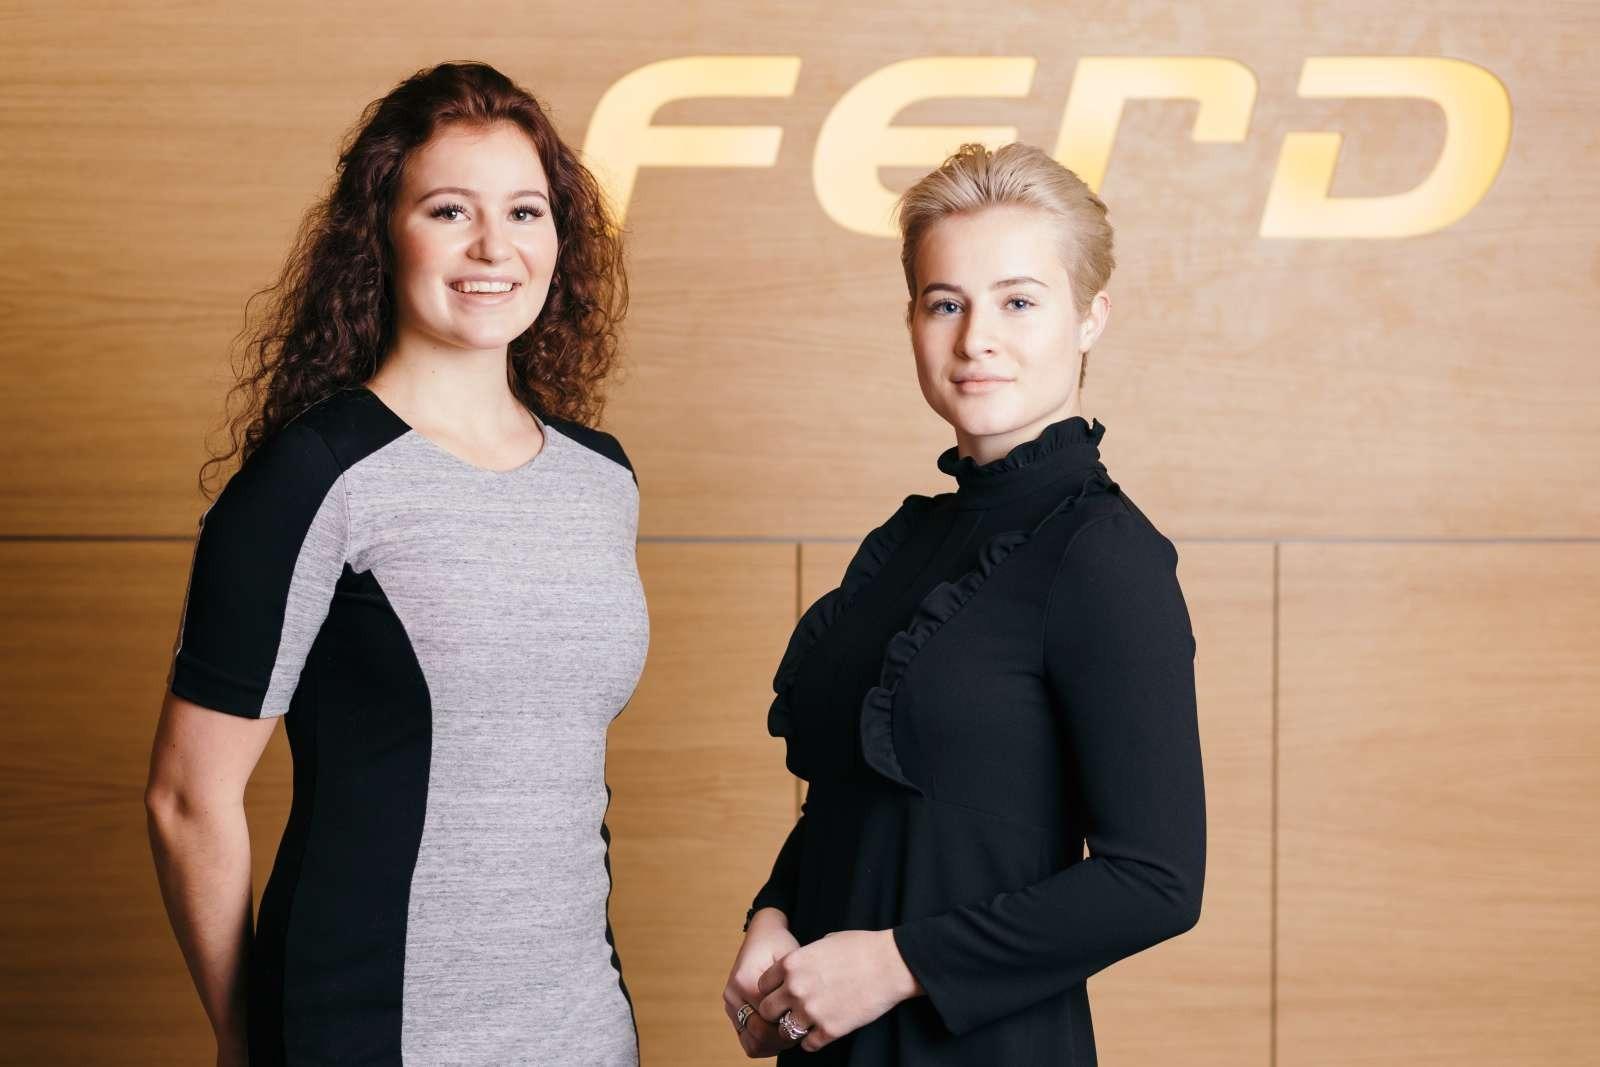 Alexandra Andresen (bên trái) và Katharina Andresen. Ảnh: Ferd.